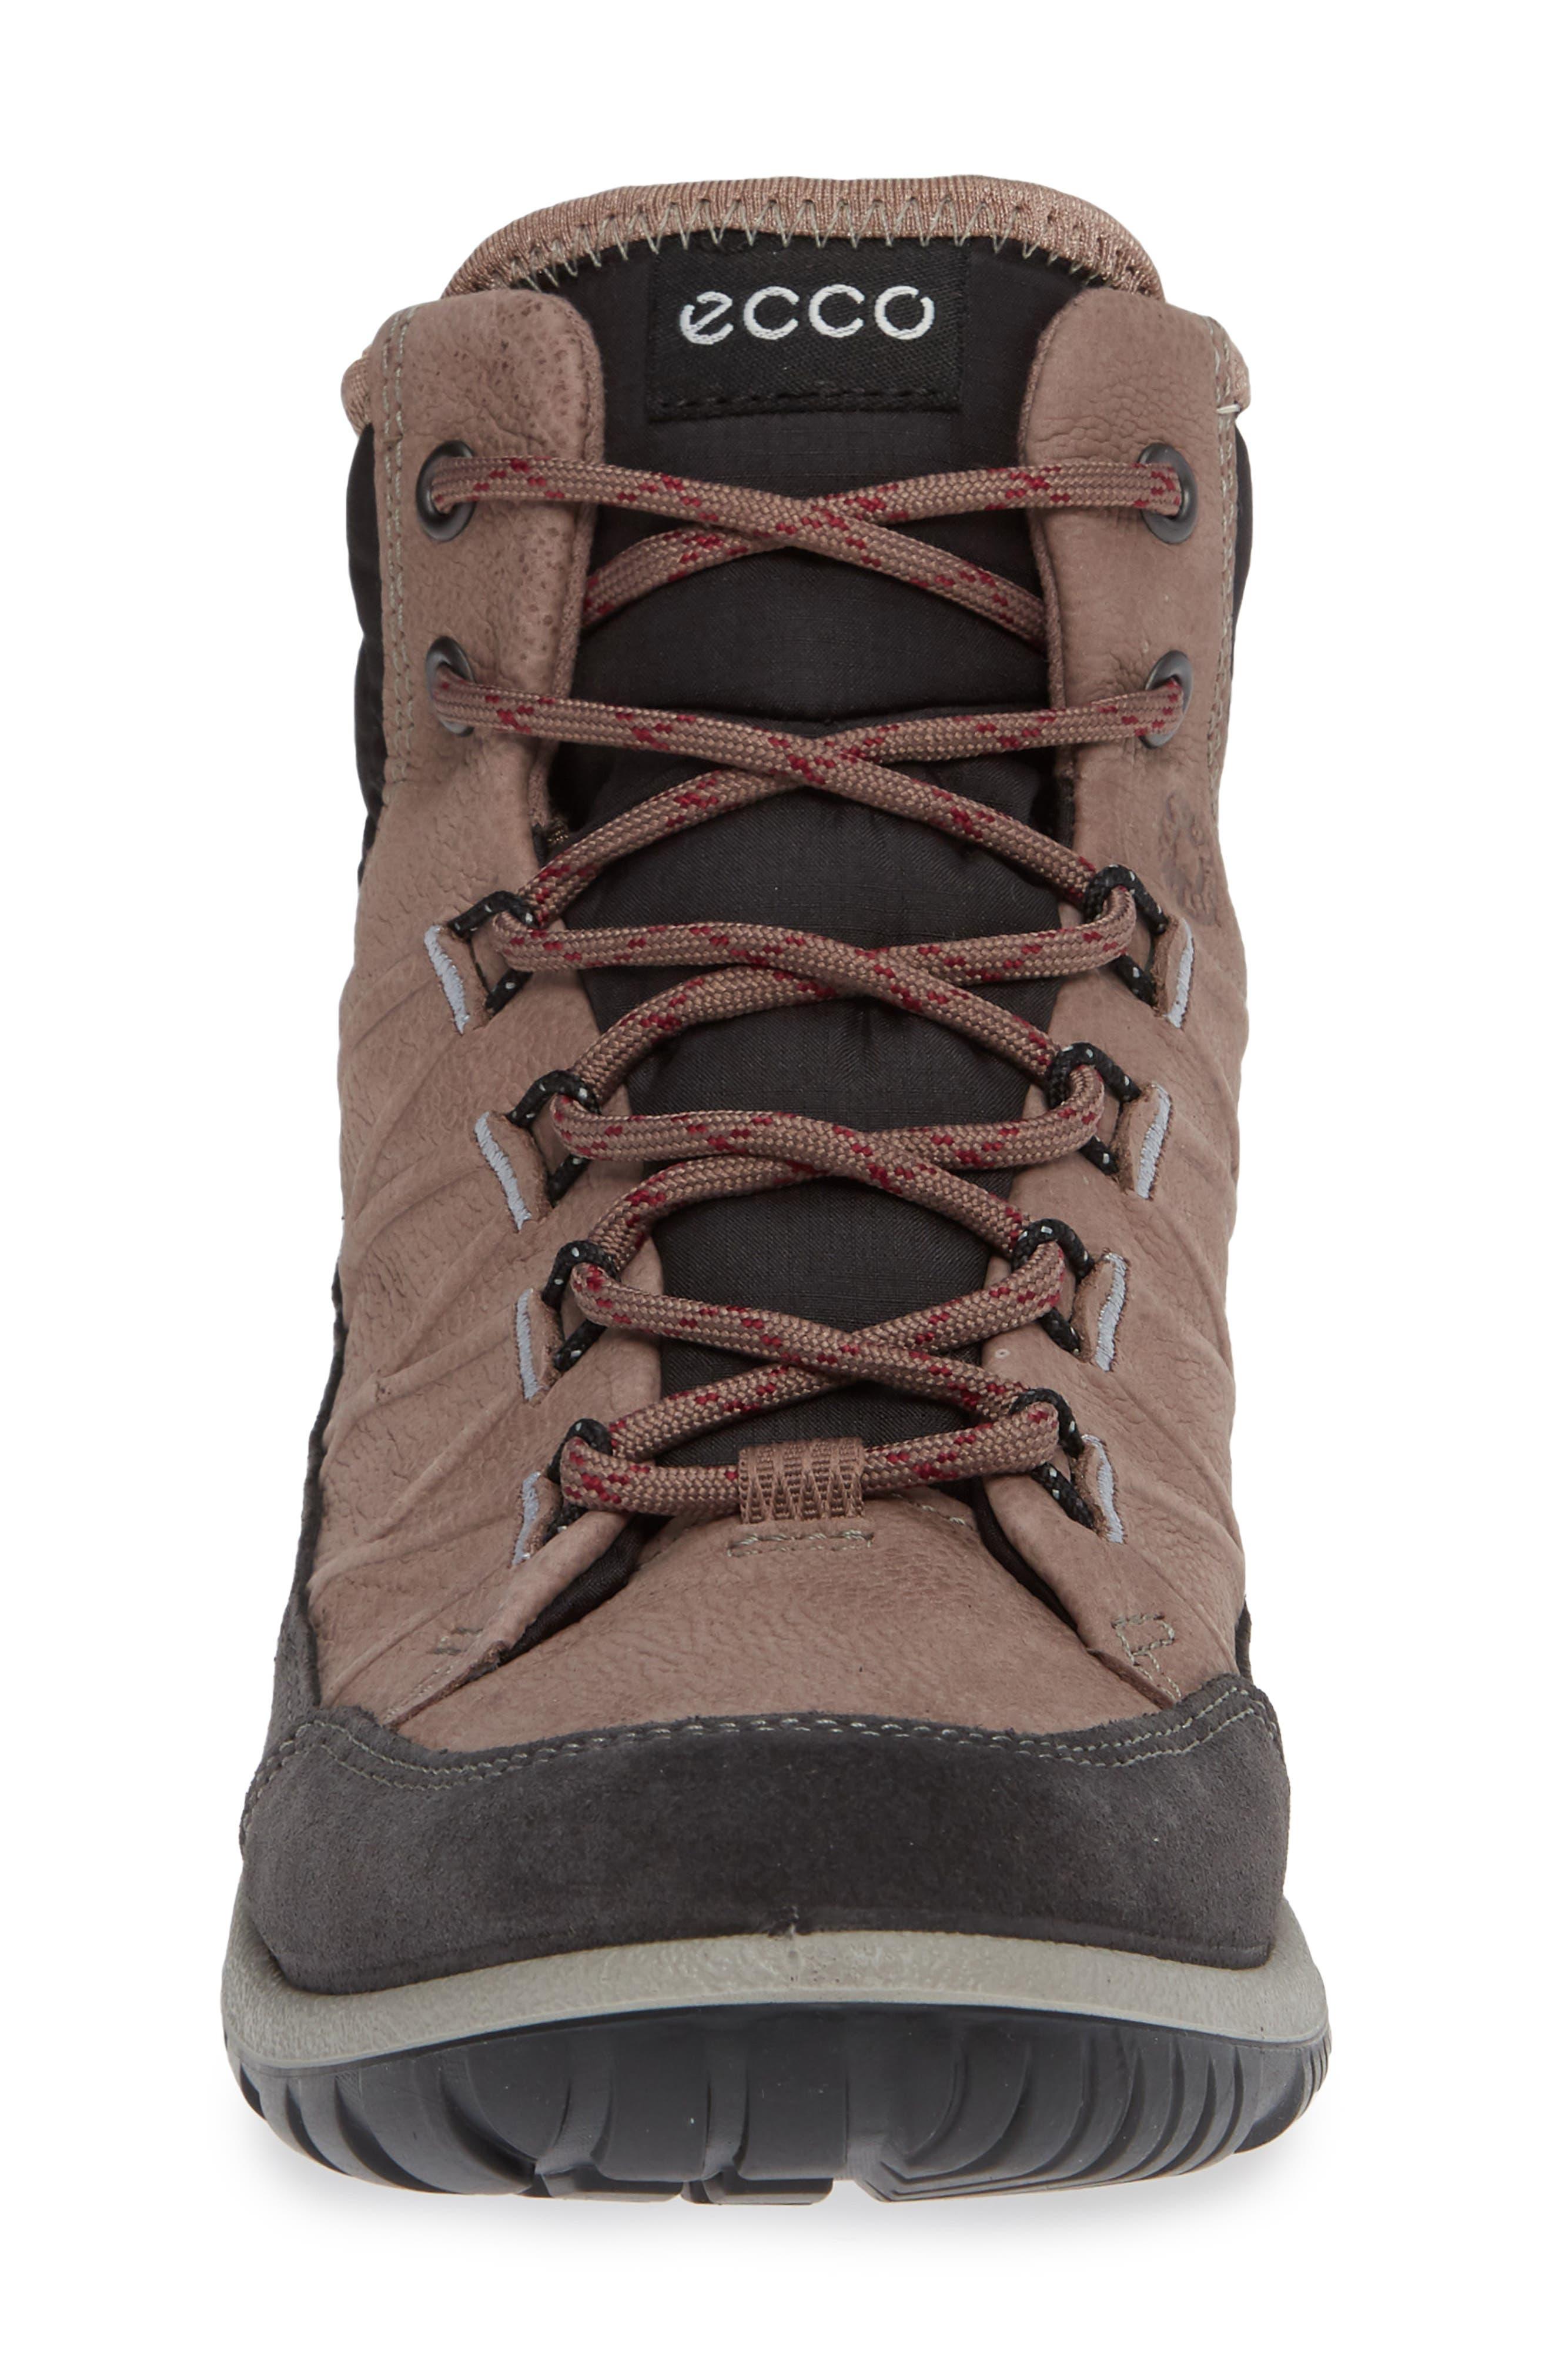 ECCO, 'Aspina GTX' Waterproof High Top Shoe, Alternate thumbnail 4, color, DEEP TAUPE NUBUCK LEATHER